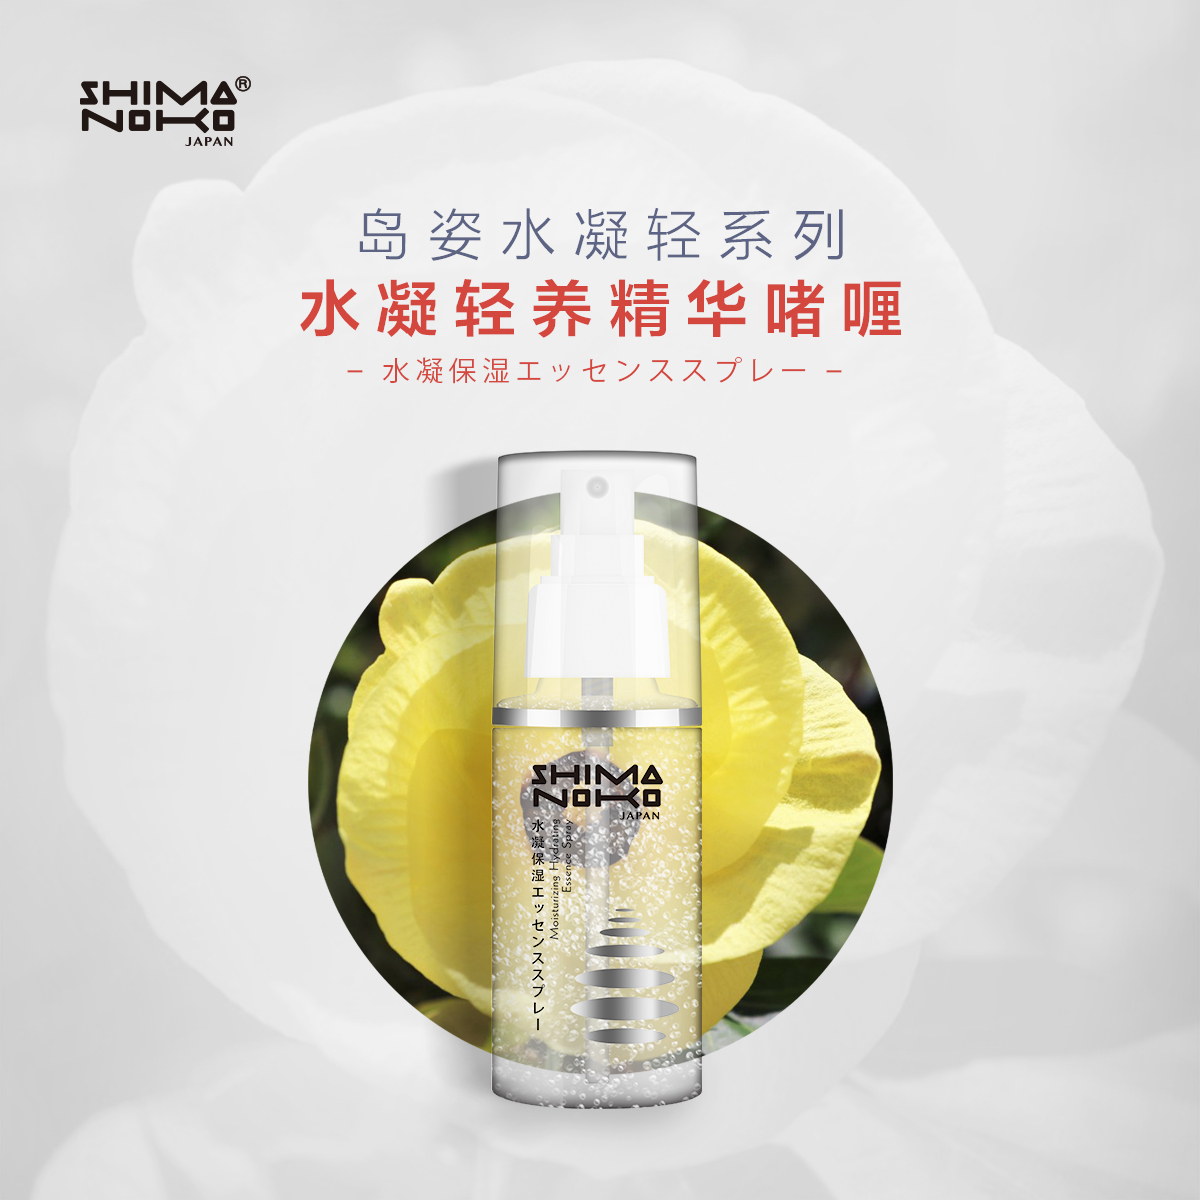 SHIMANOKO/ Island pose gel Essence Facial essence repair toner spray replenishment water lock moisturizing female